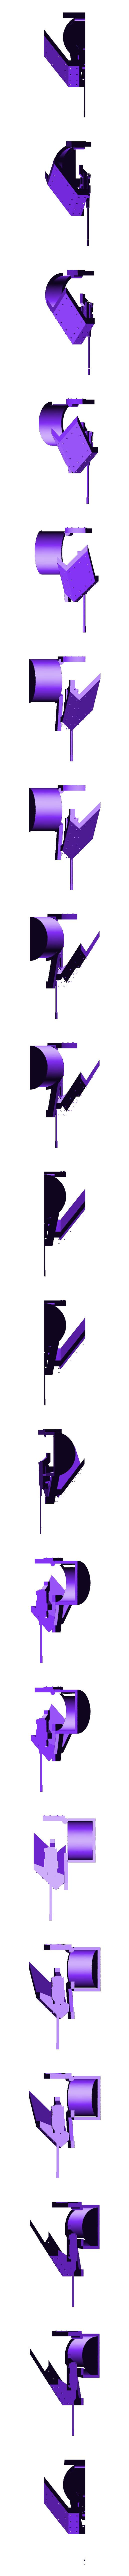 Gun-half-B.stl Download STL file 3D Printable Call of Duty Warzone Truck • 3D printable object, jorgeciprian